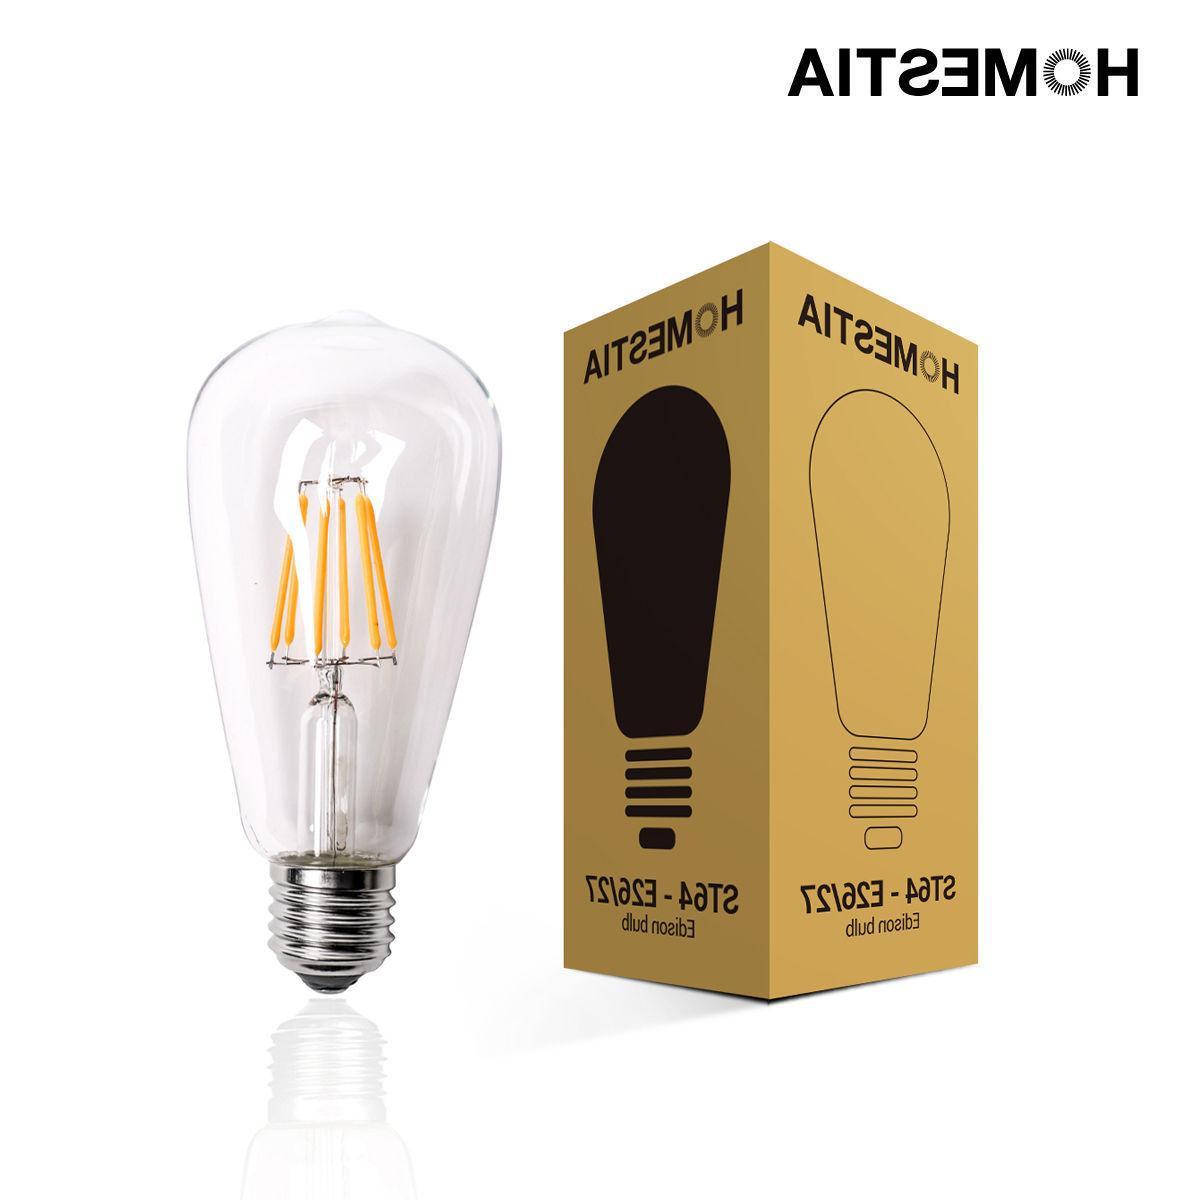 LOT-10 Vintage E27 Screw Filament Bulb Light